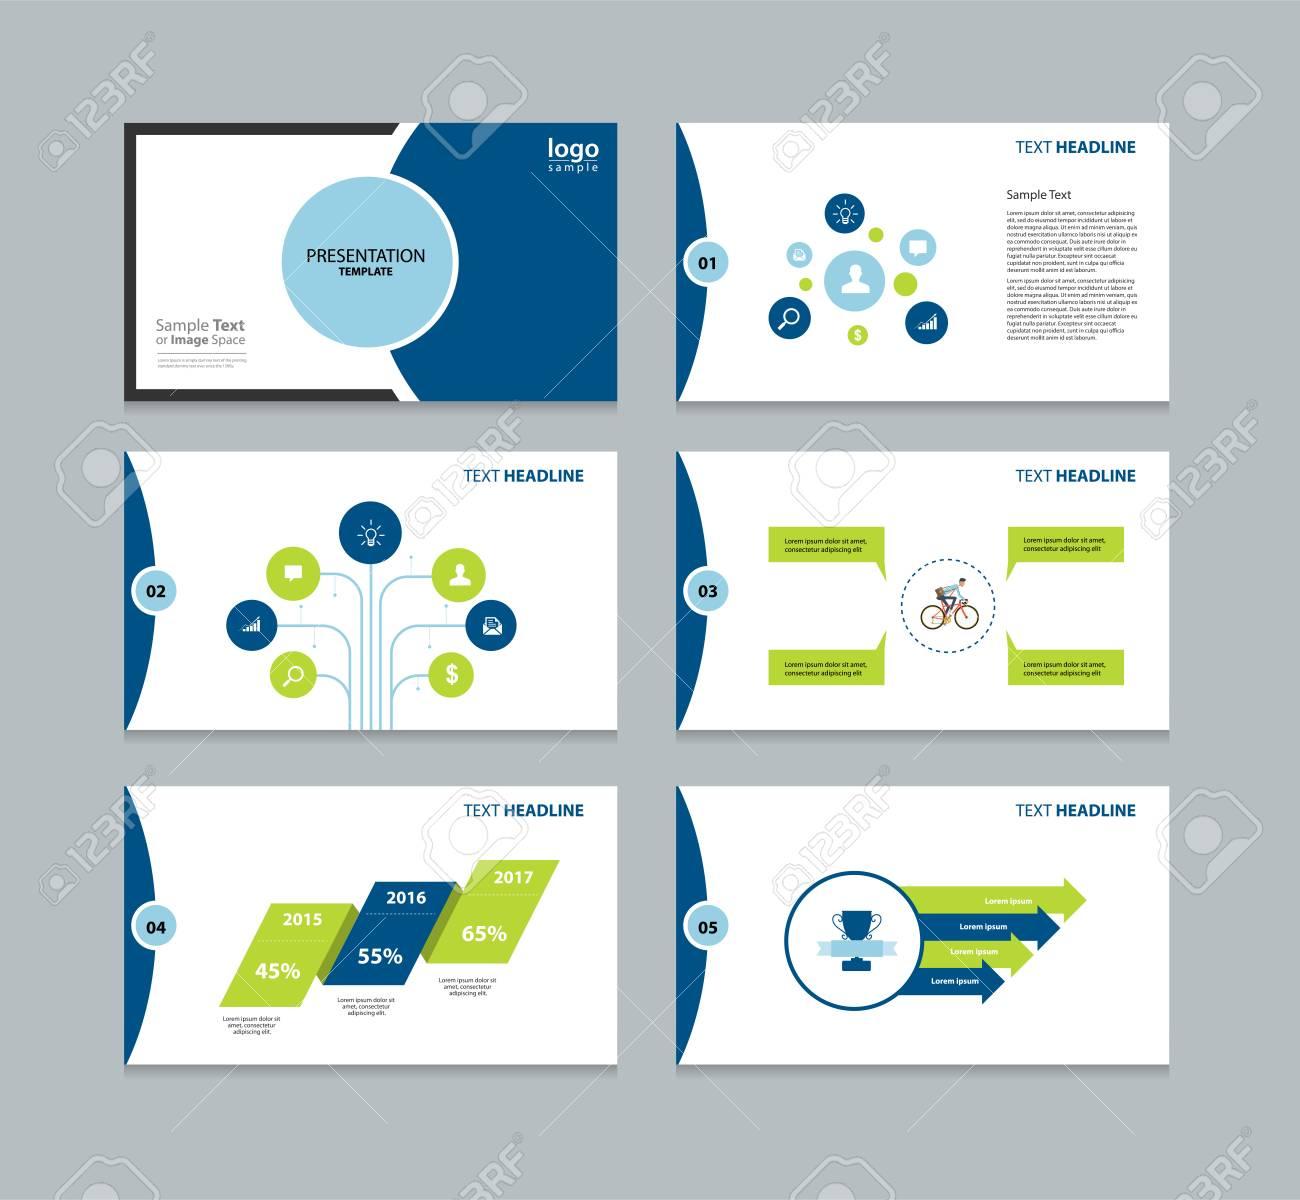 Presentation Template Fo Graphic Element Design Template For